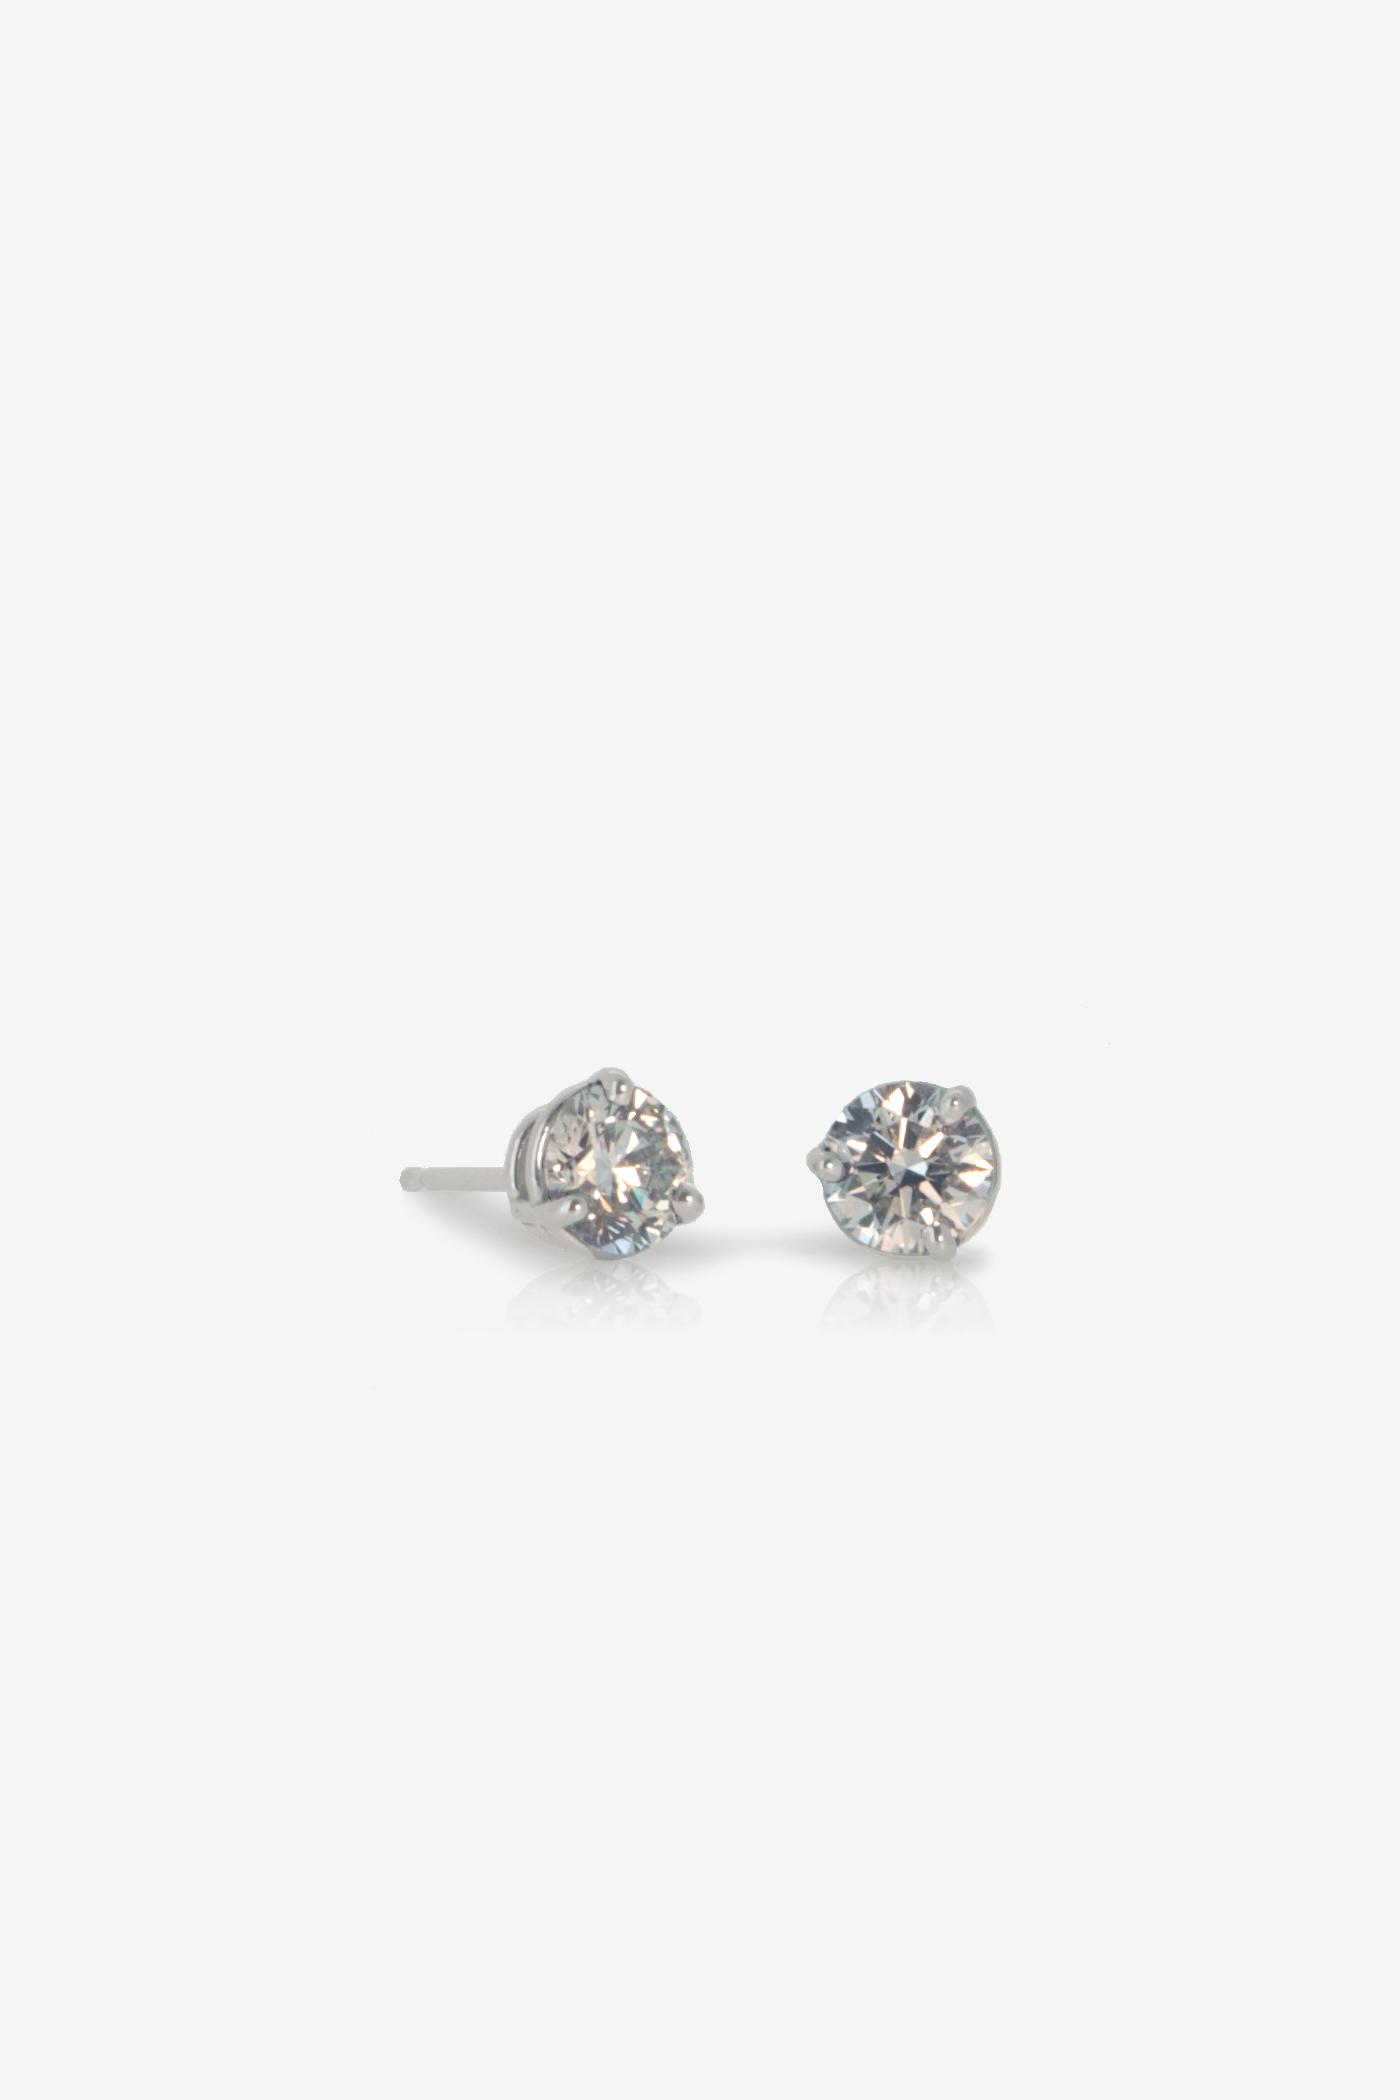 1.10ct Canada Mark GIA diamond earrings